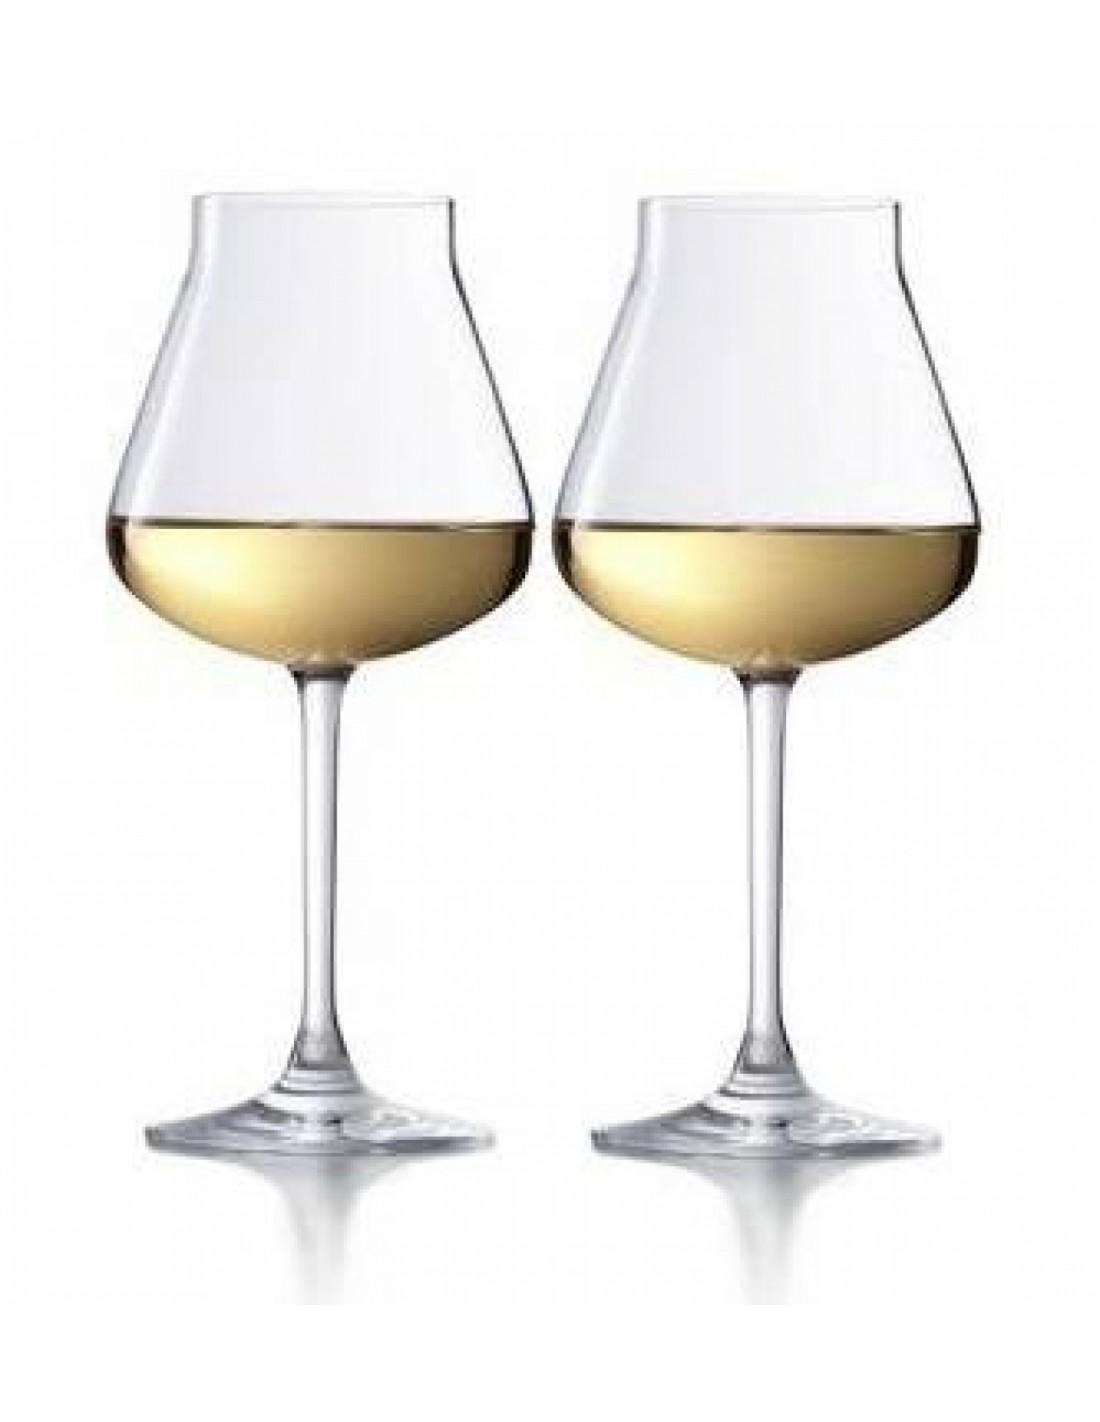 Ch teau baccarat verre vin blanc x 2 for Verre 51 piscine design tabac